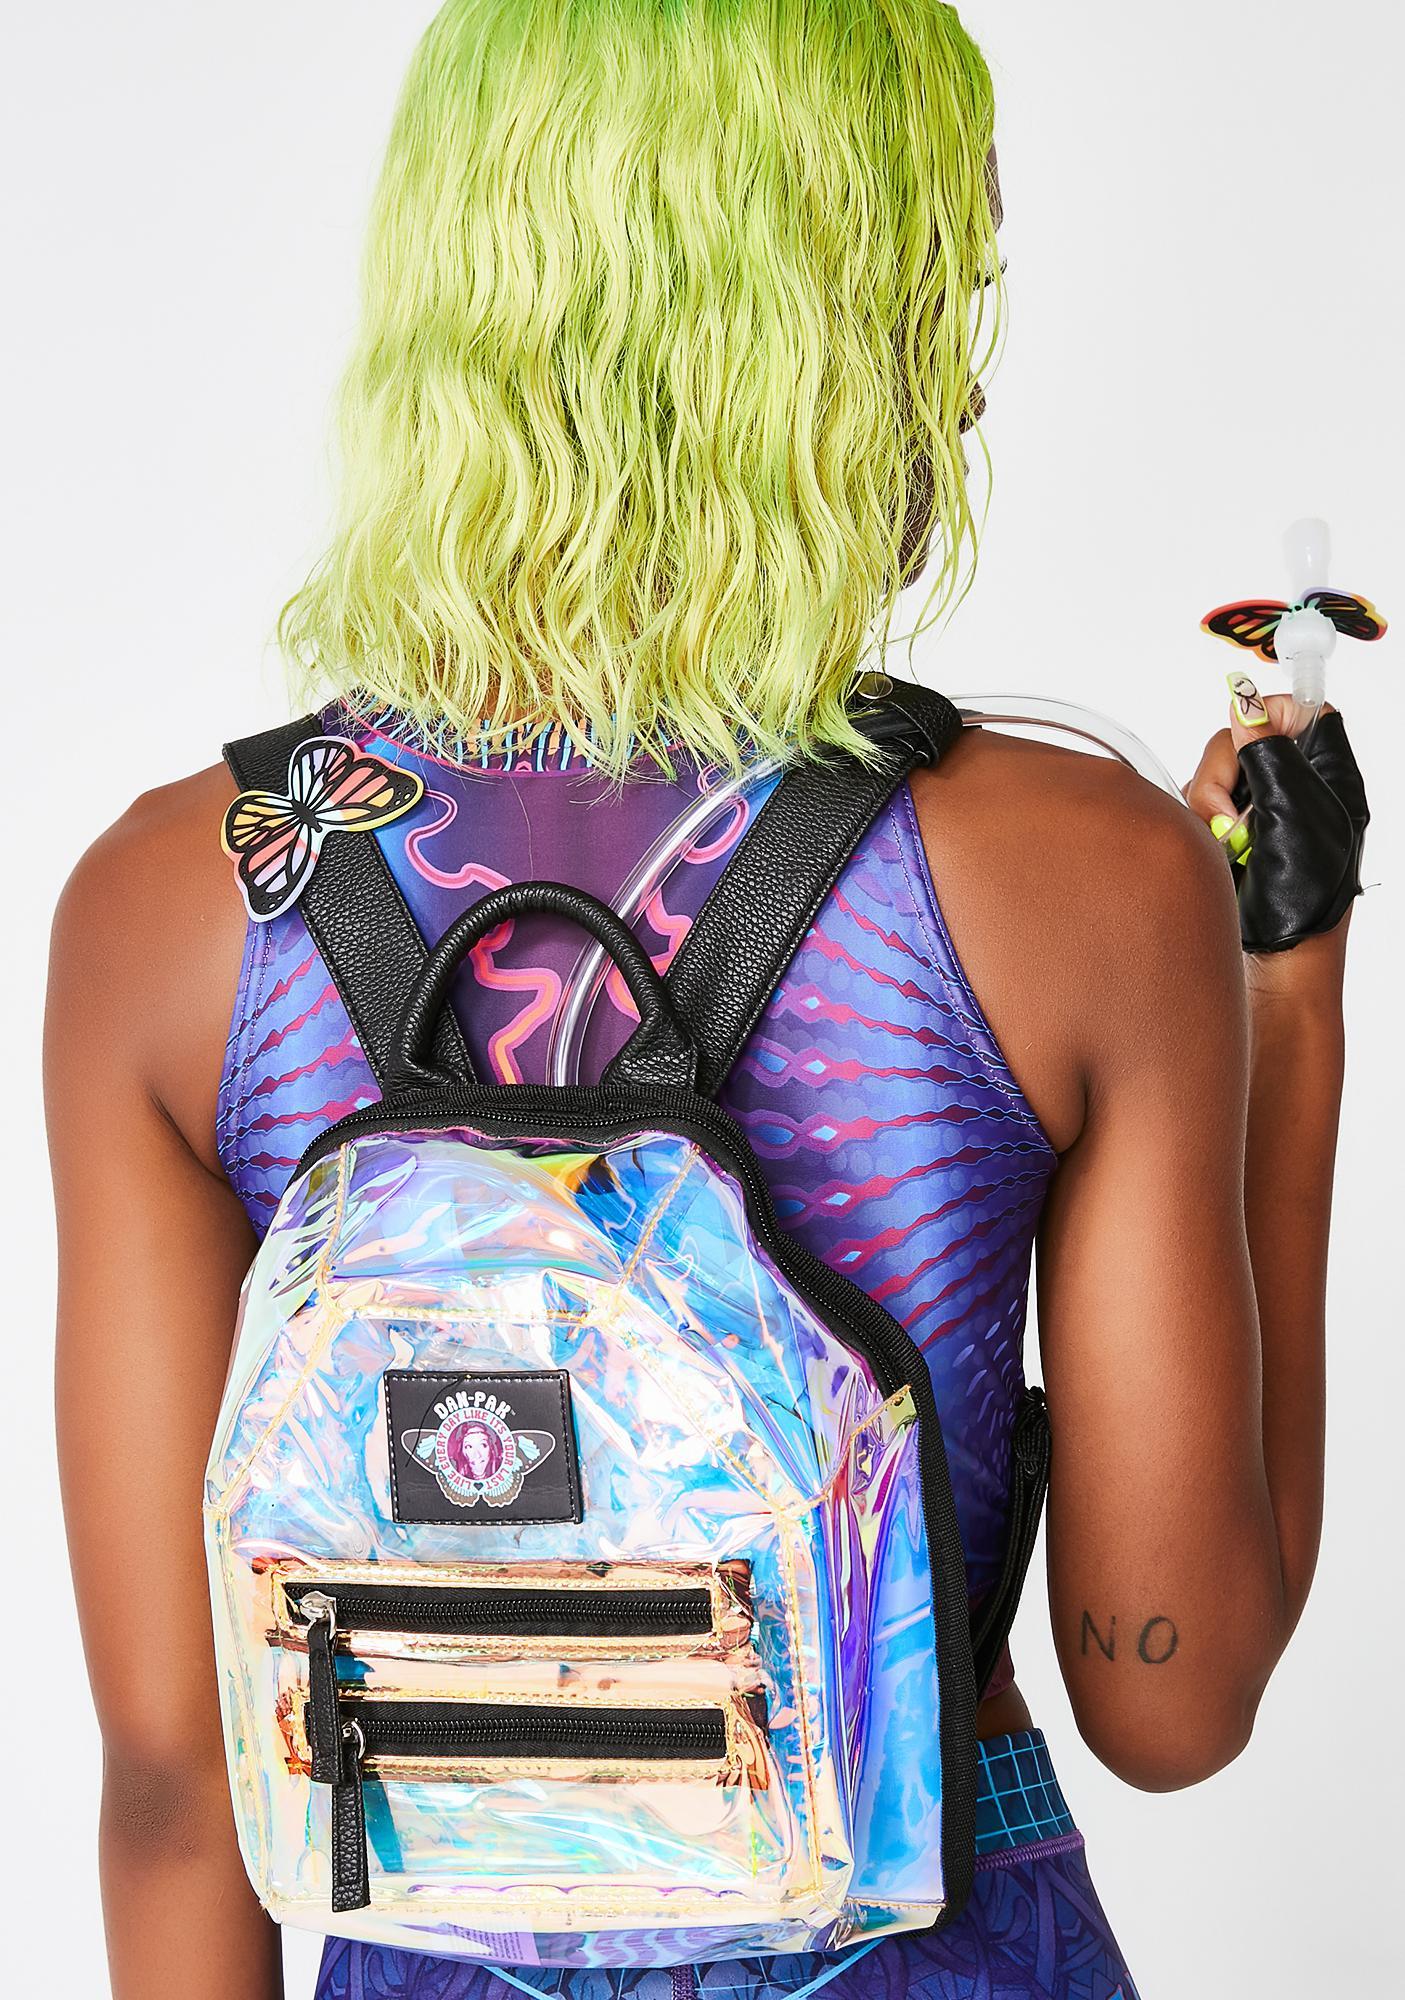 Dan-Pak Holographic Mini Hydration Backpack